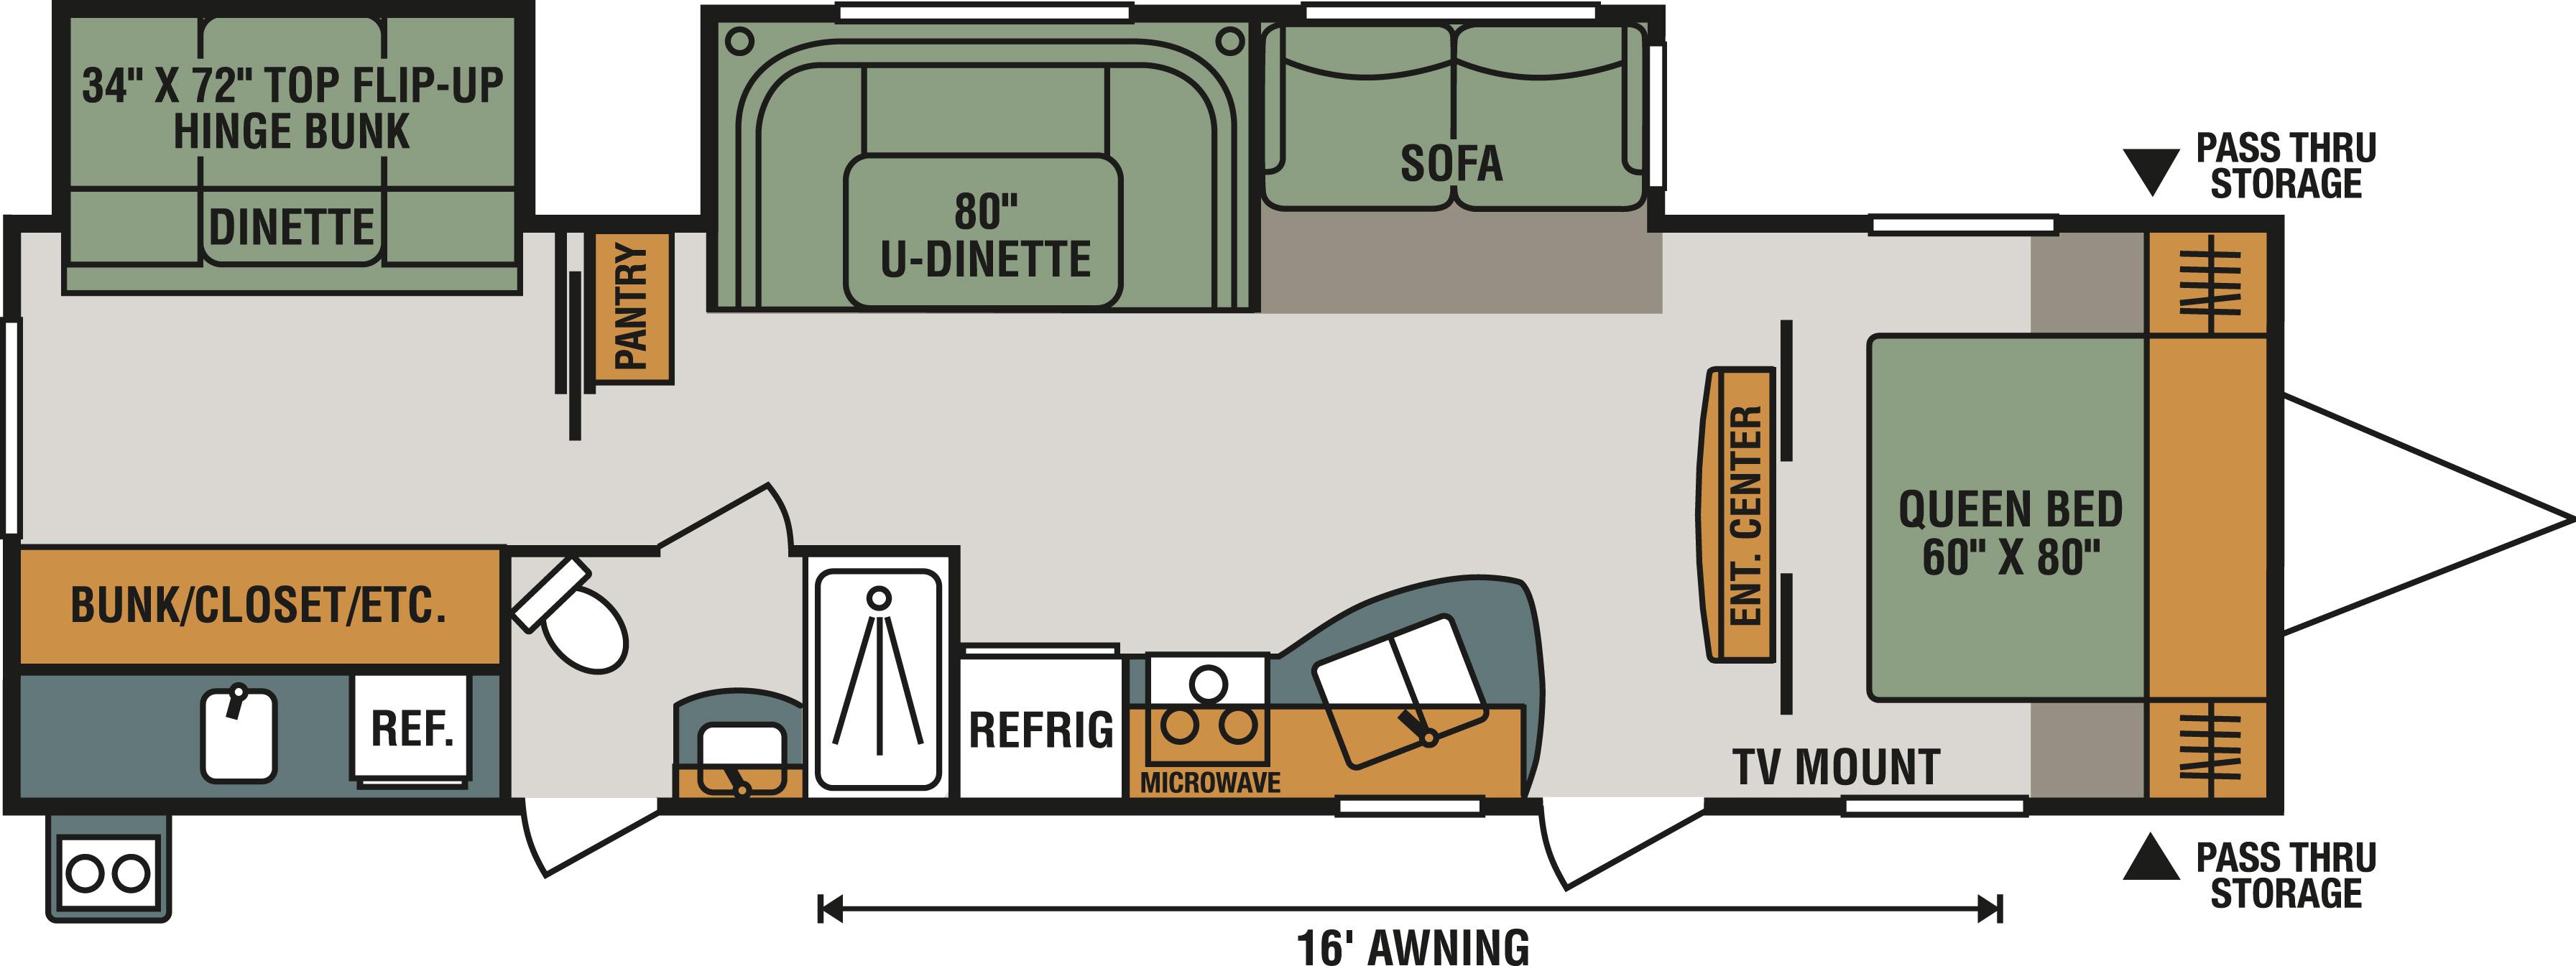 kz rv wiring diagram wiring diagramskz rv wiring diagram wiring diagram gp kz rv wiring diagram kz rv wiring diagram